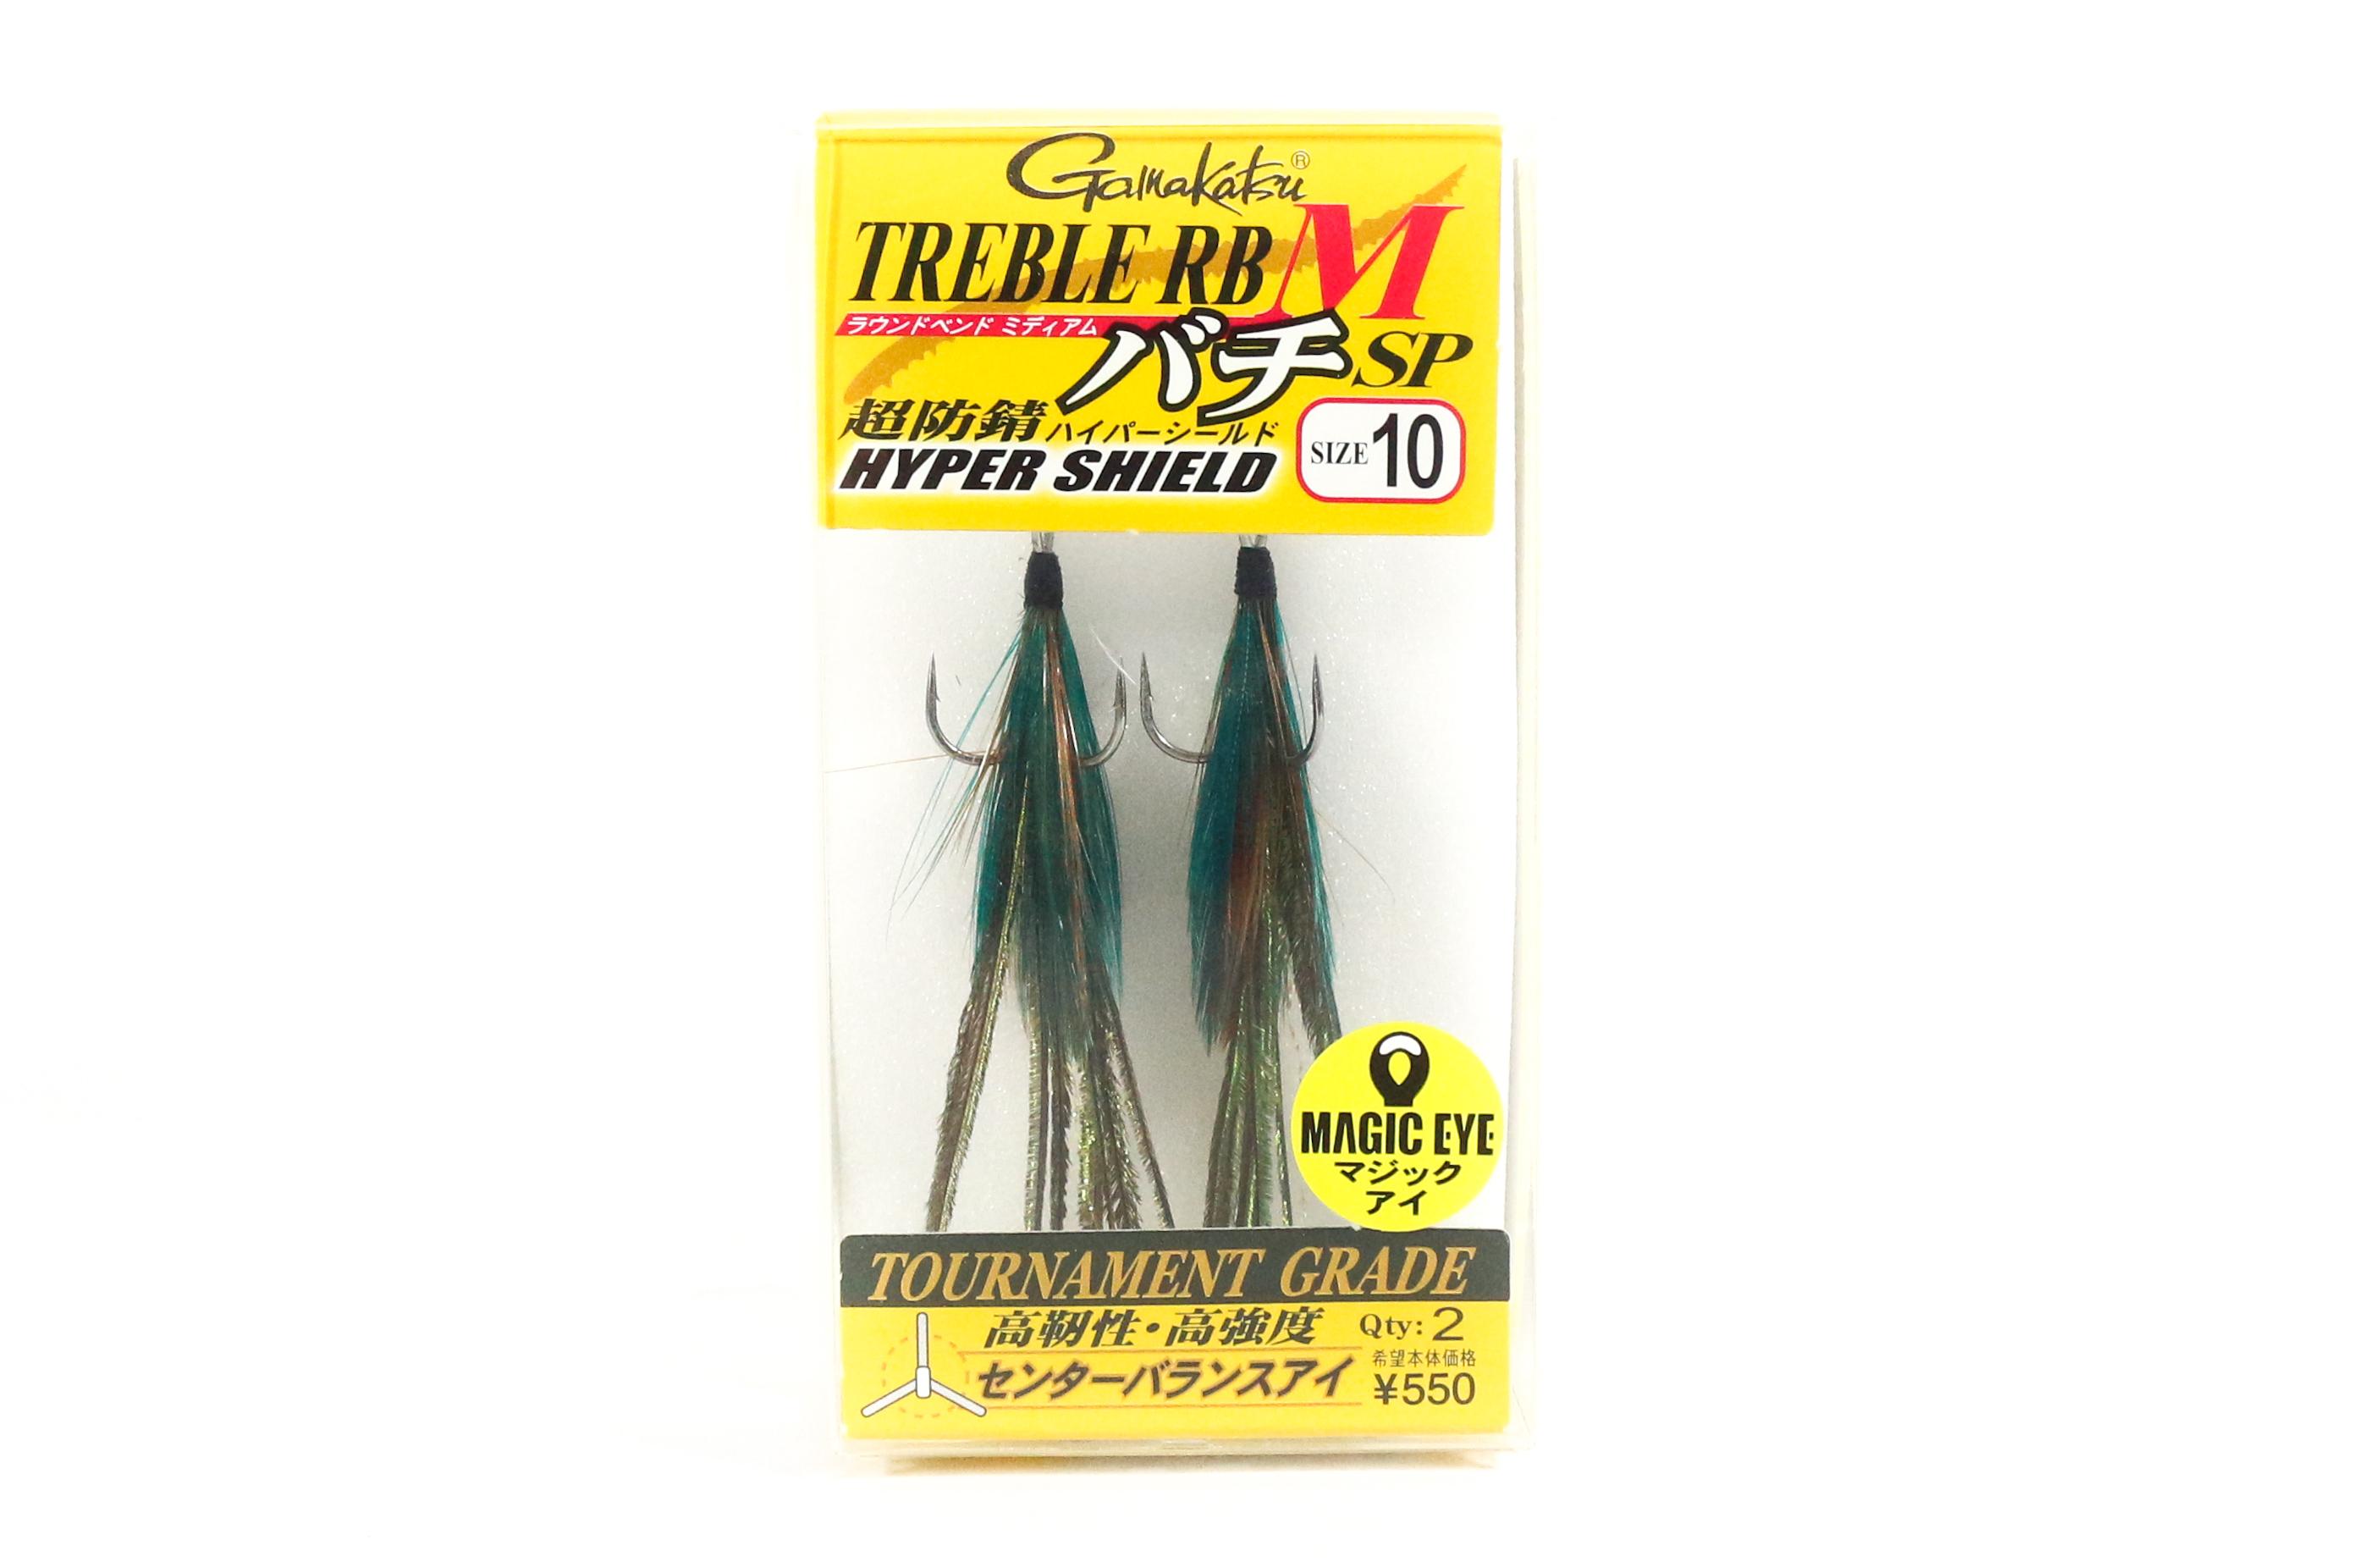 Gamakatsu Treble Hook RB M SP Feather Type Hyper Shield Size 10 (3844)